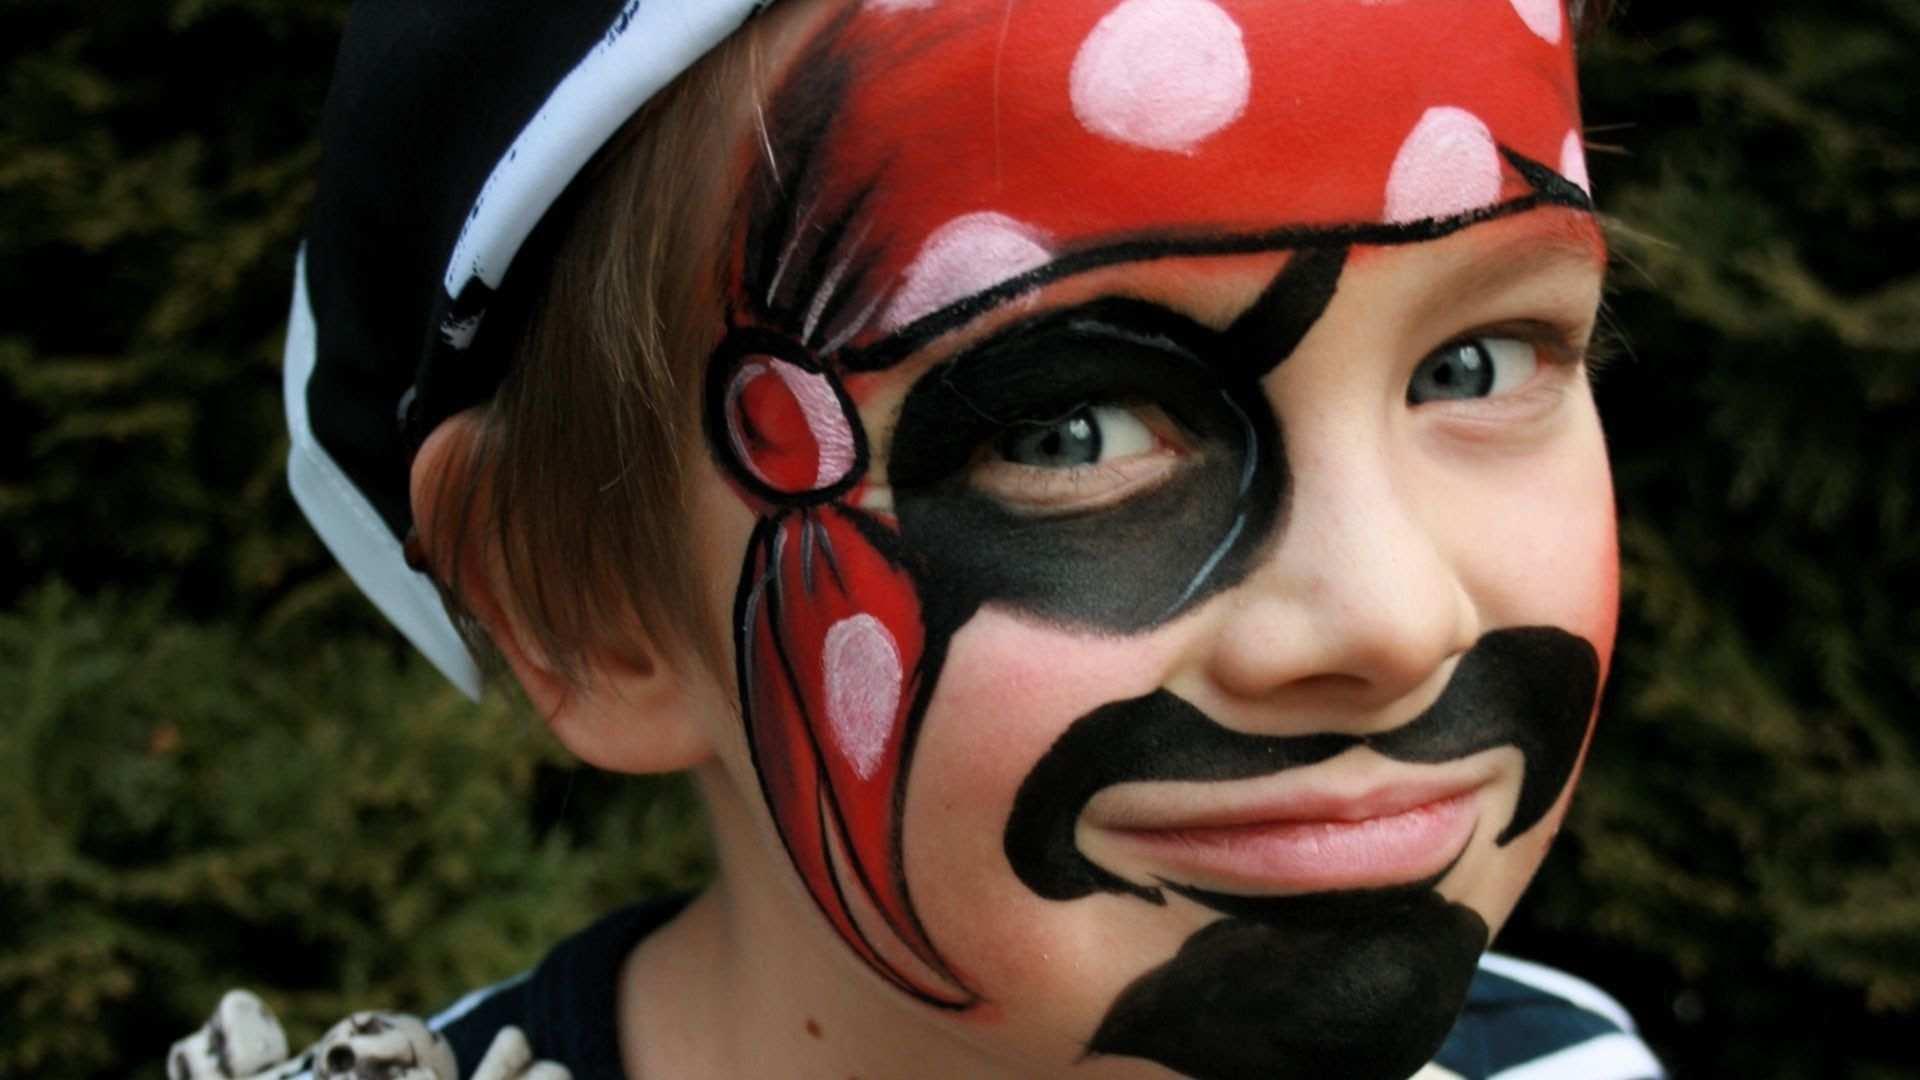 Pirate Face Painting Tutorial Pirate Makeup Pirate Face Pirate Face Paintings Face Painting